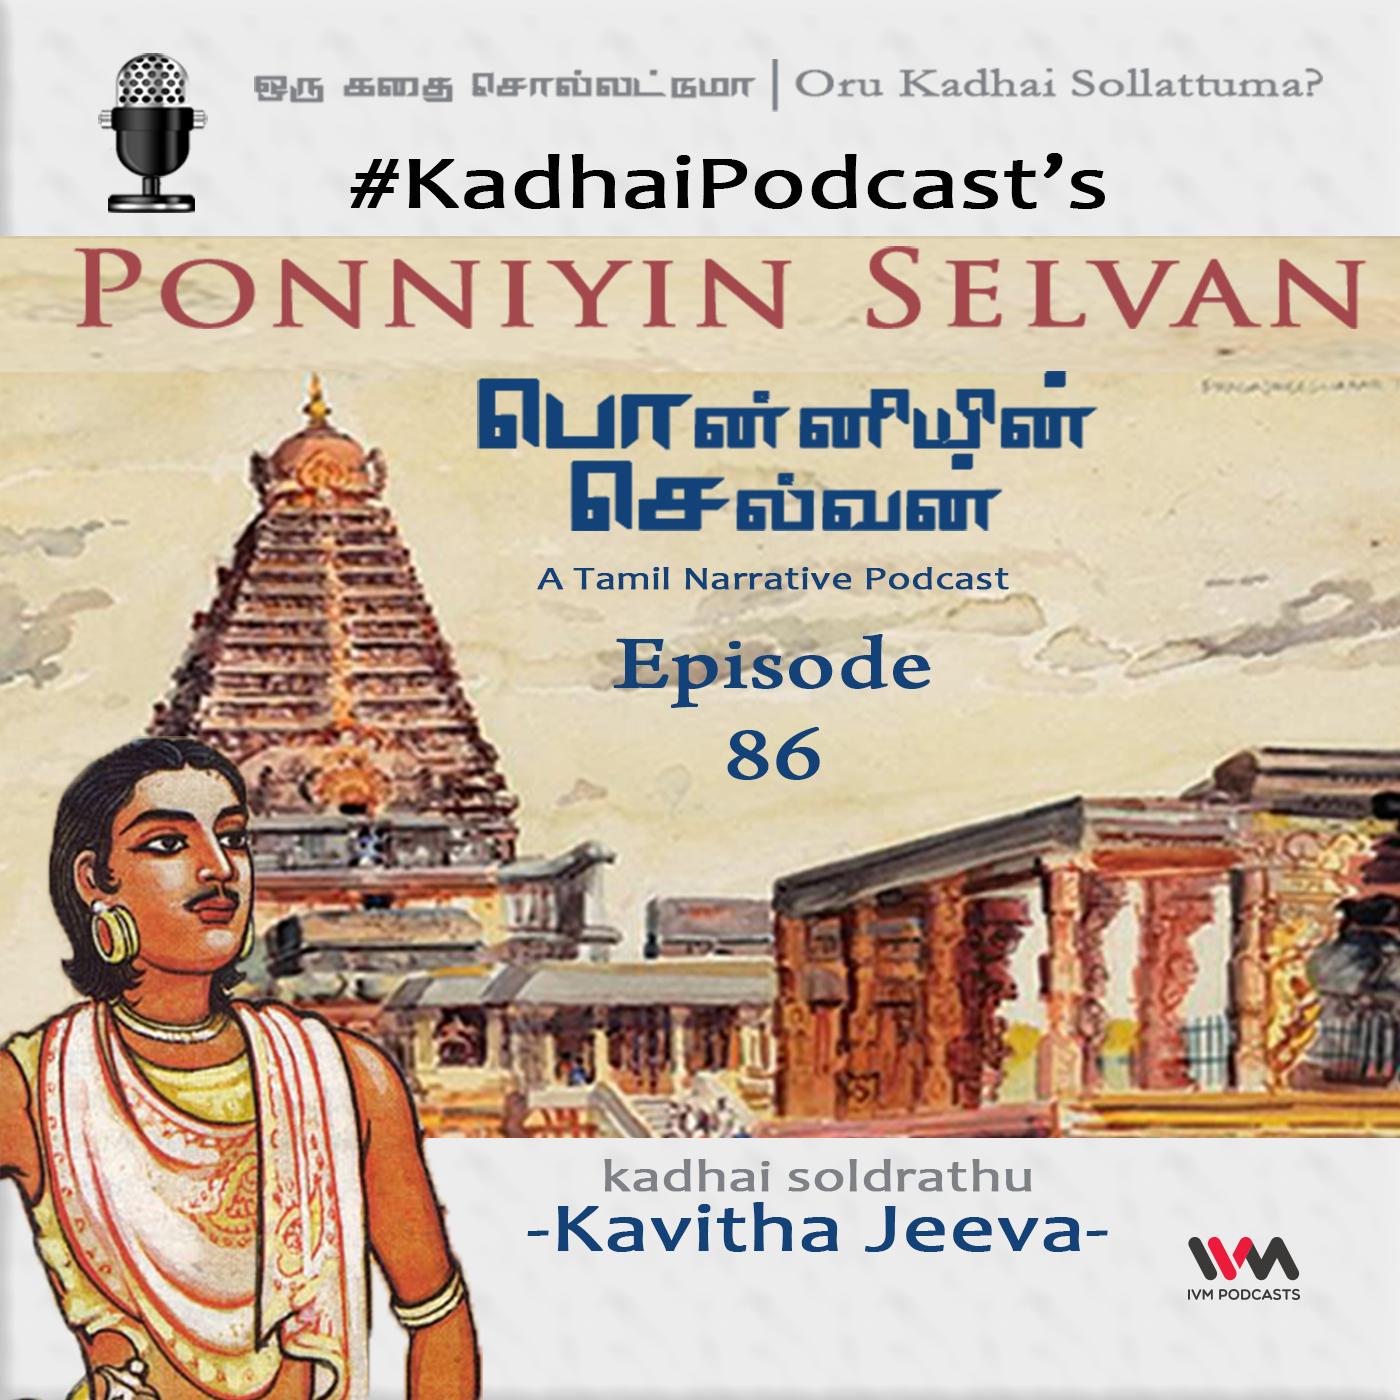 KadhaiPodcast's Ponniyin Selvan - Episode # 86